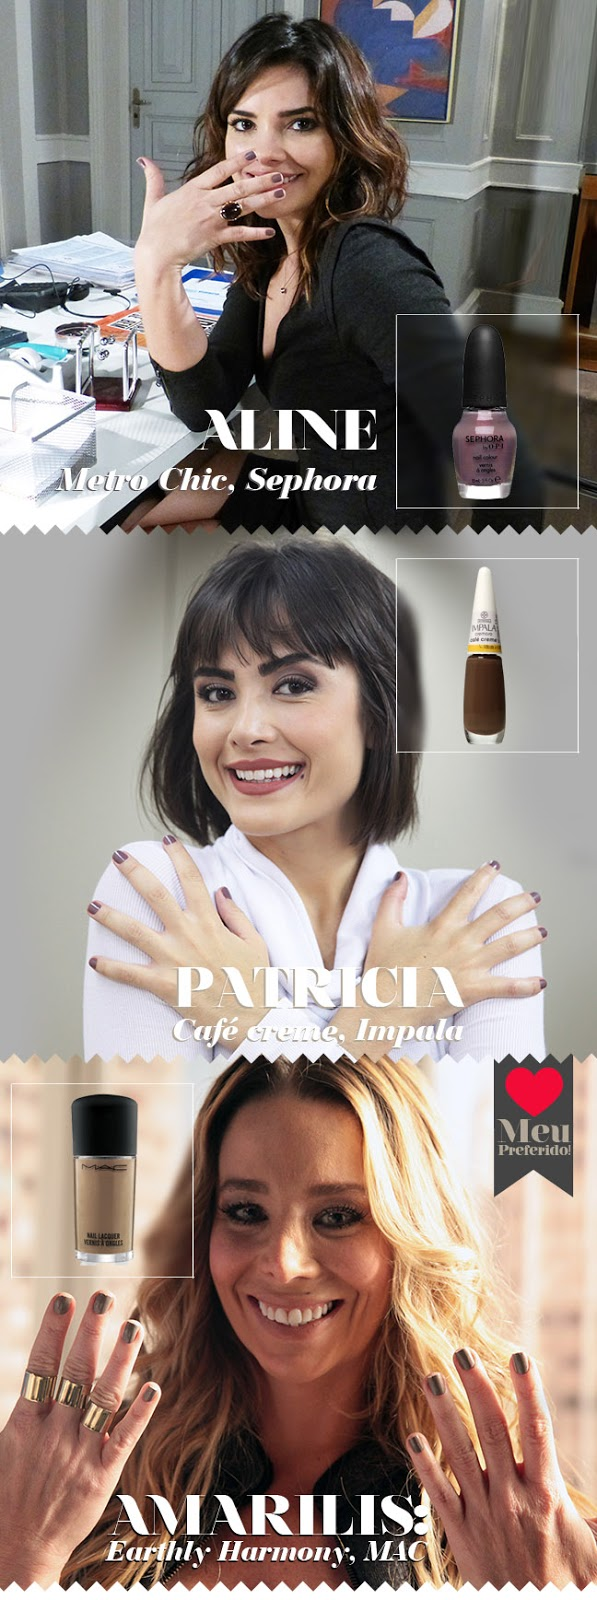 blog de moda brasilia Metro Chic Sephora by OPI  Earthly Harmony  MAC  café creme impala